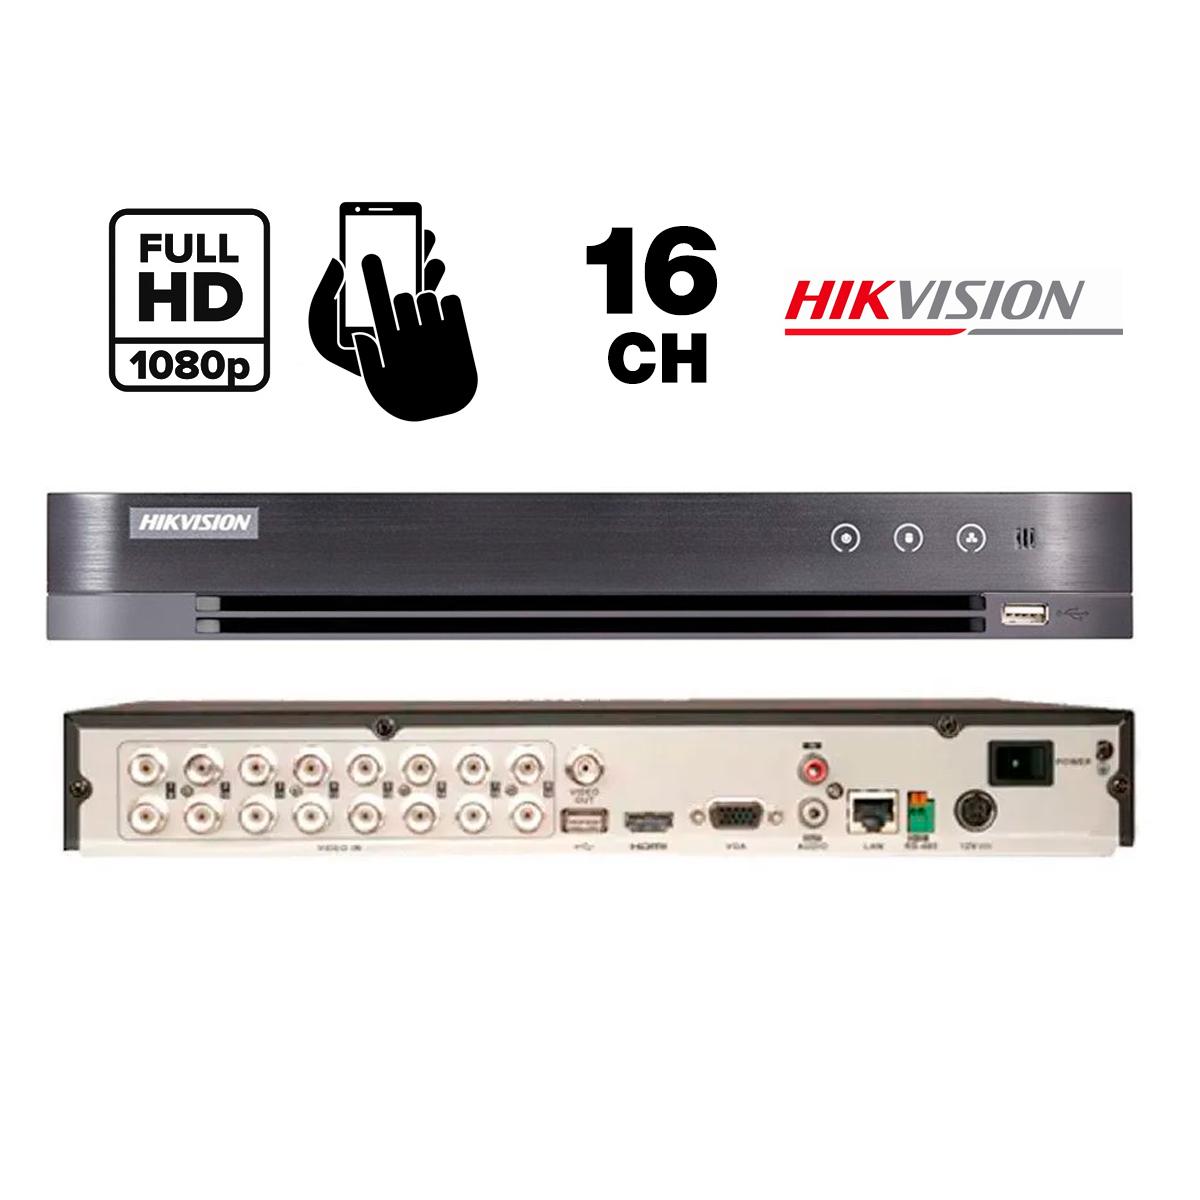 dvr-hikvision-16ch-1080p-3mp-full-hd01